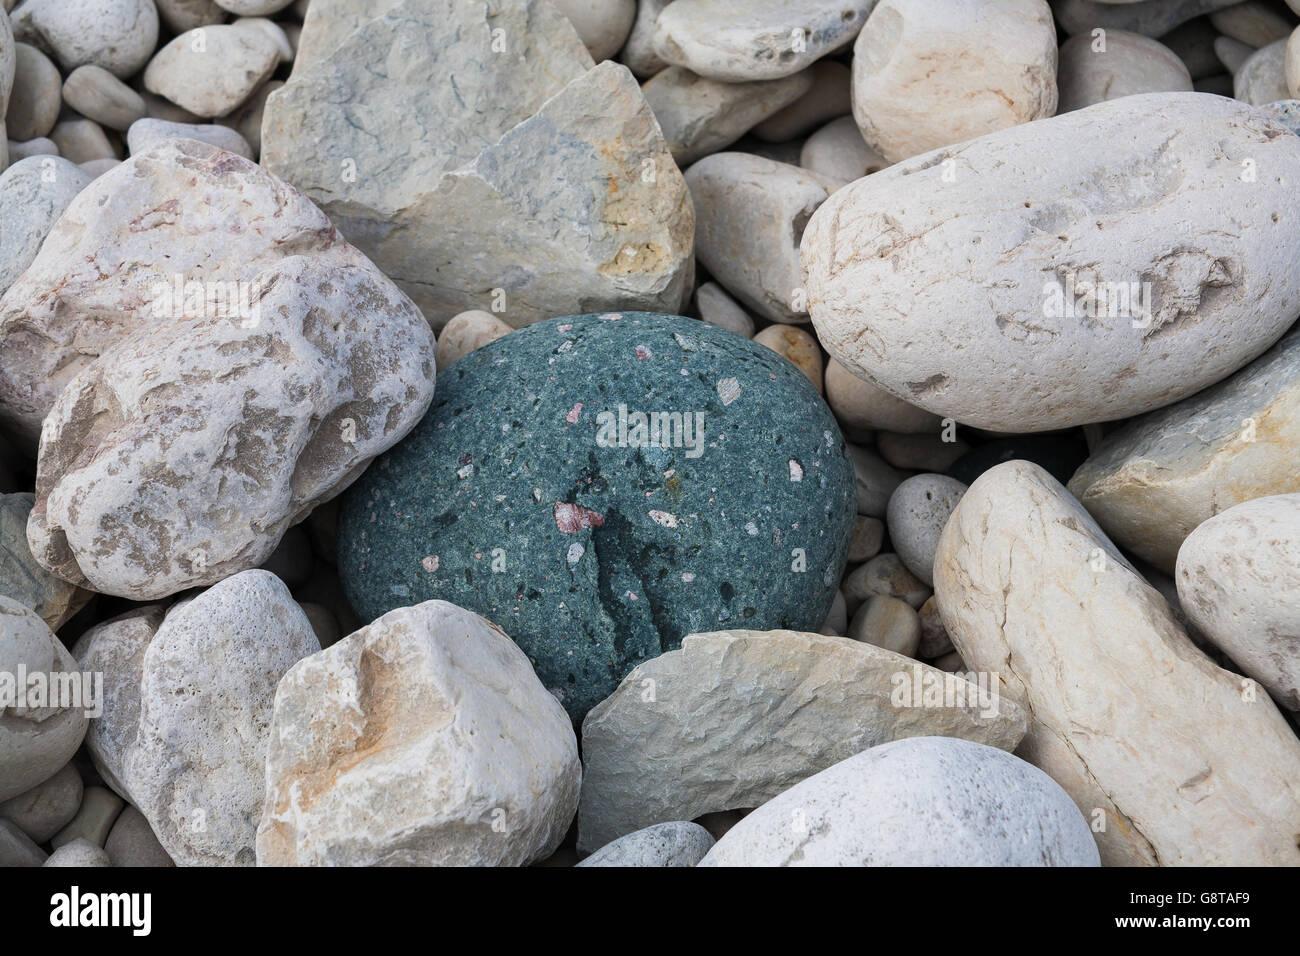 Rocks on the beach at Halfway Log Dump in Bruce Peninsula National Park near Tobermory, Ontario, Canada - Stock Image